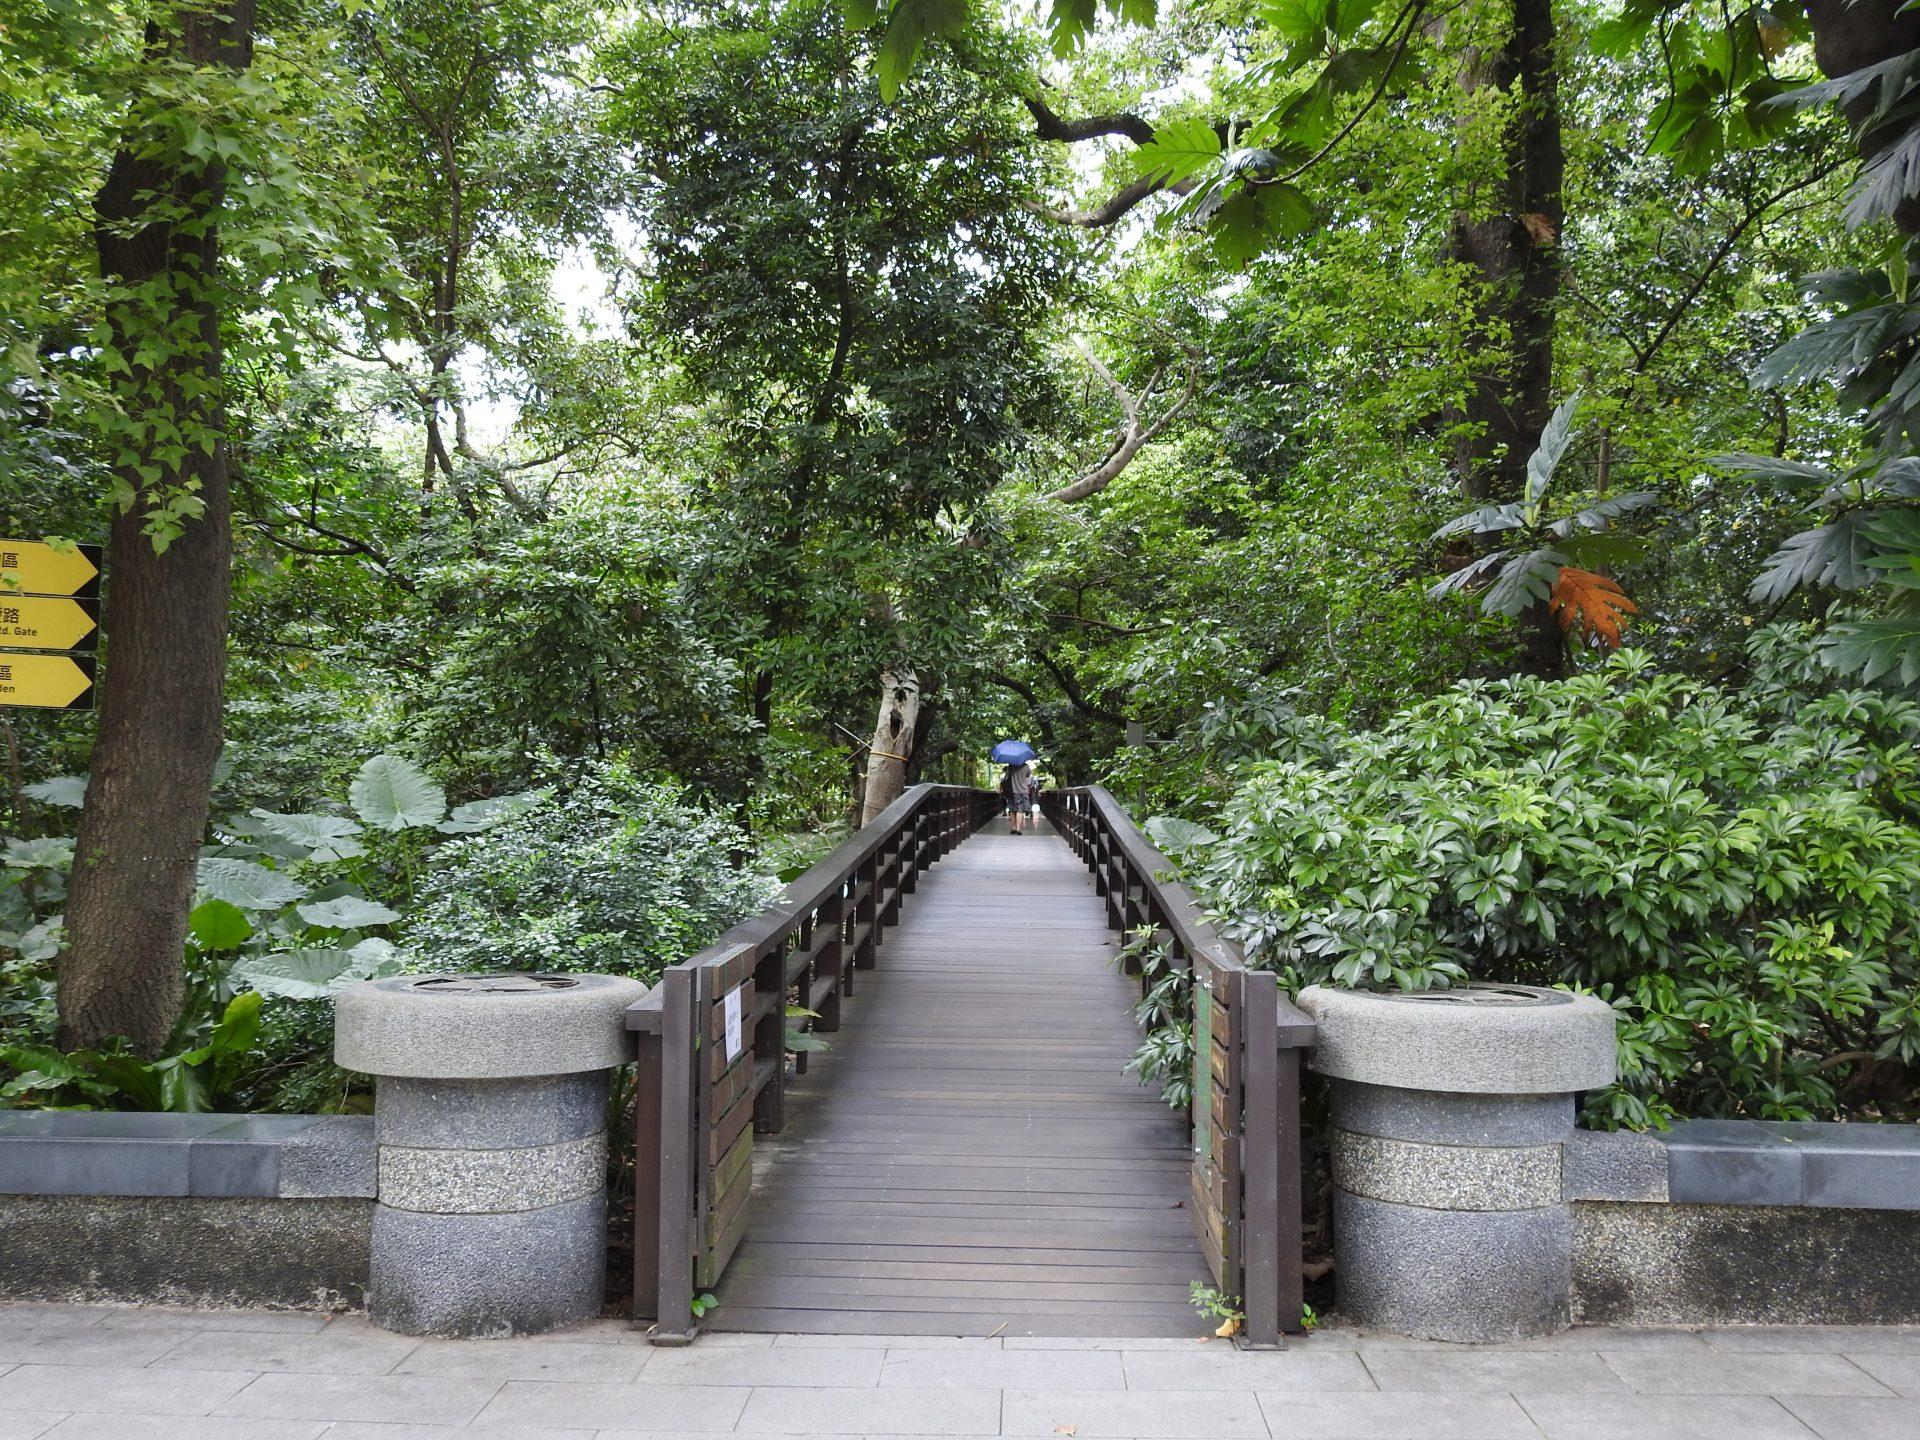 Taipei Botanical Garden was the first botanical garden in Taiwan. (Image: Billy Shyu/ Vision Times)